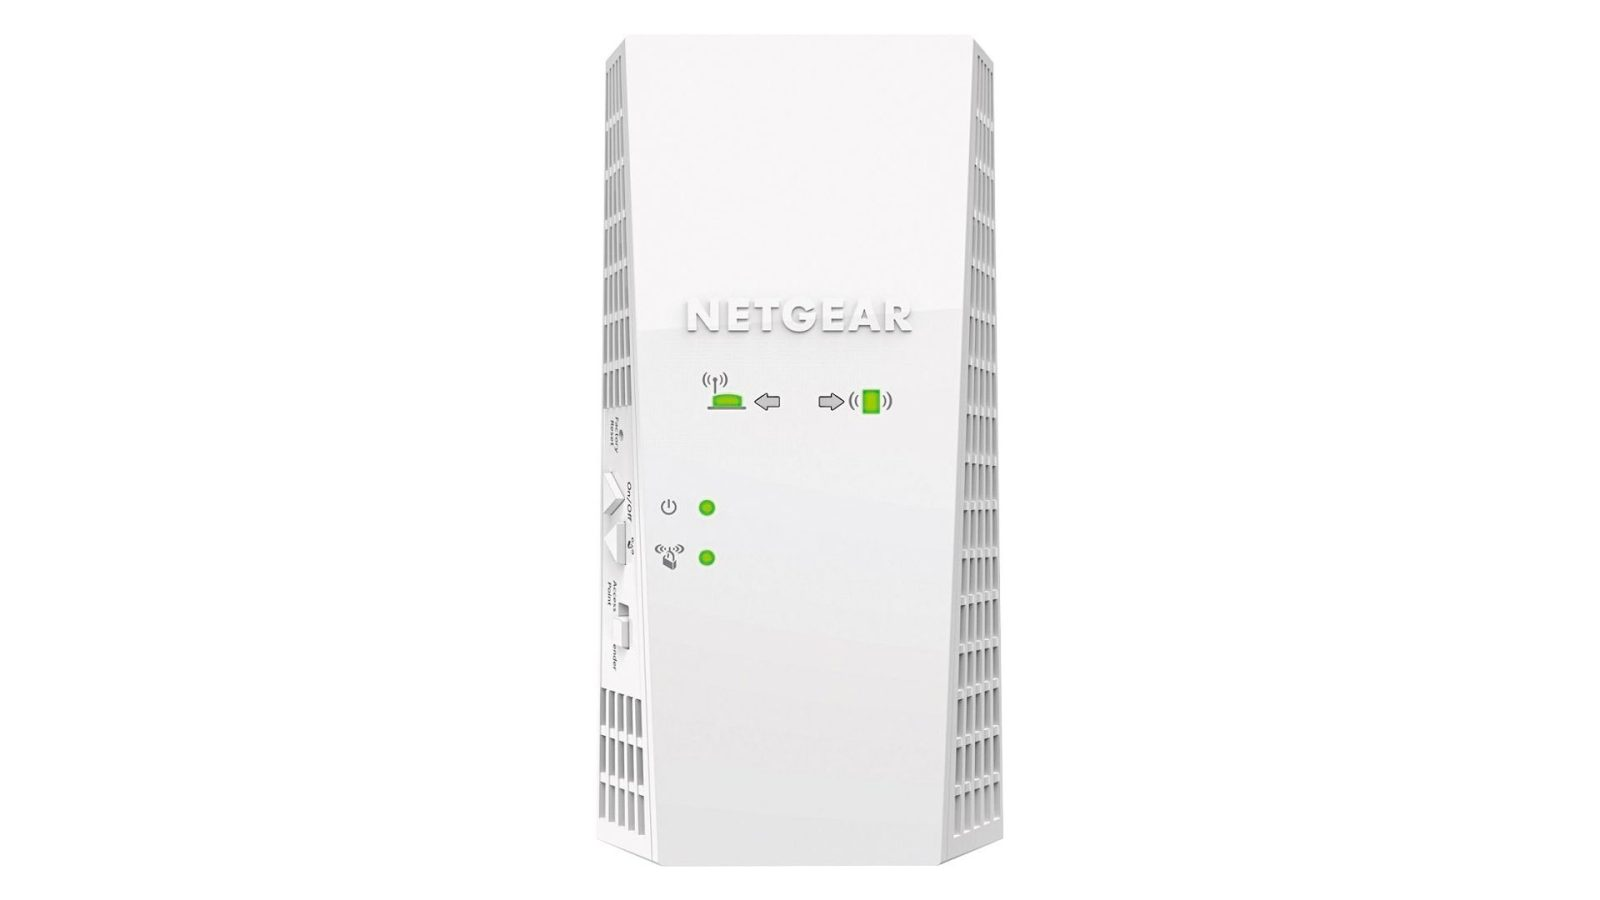 NETGEAR's $35 802.11ac Wi-Fi Extender upgrades your home (Refurb, Orig. $140)